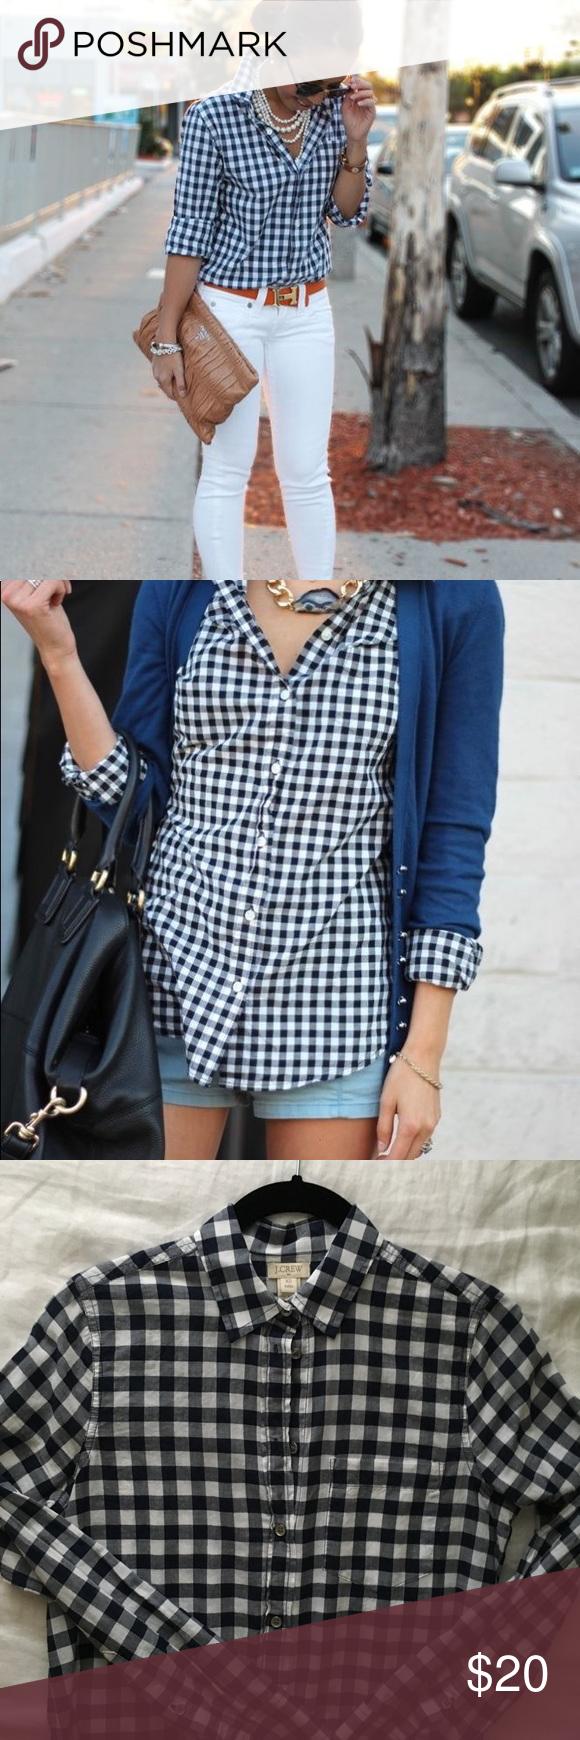 Navy blue flannel shirt womens  J Crew Navy Blue Checkered Shirt  Blue checkered shirt Navy blue